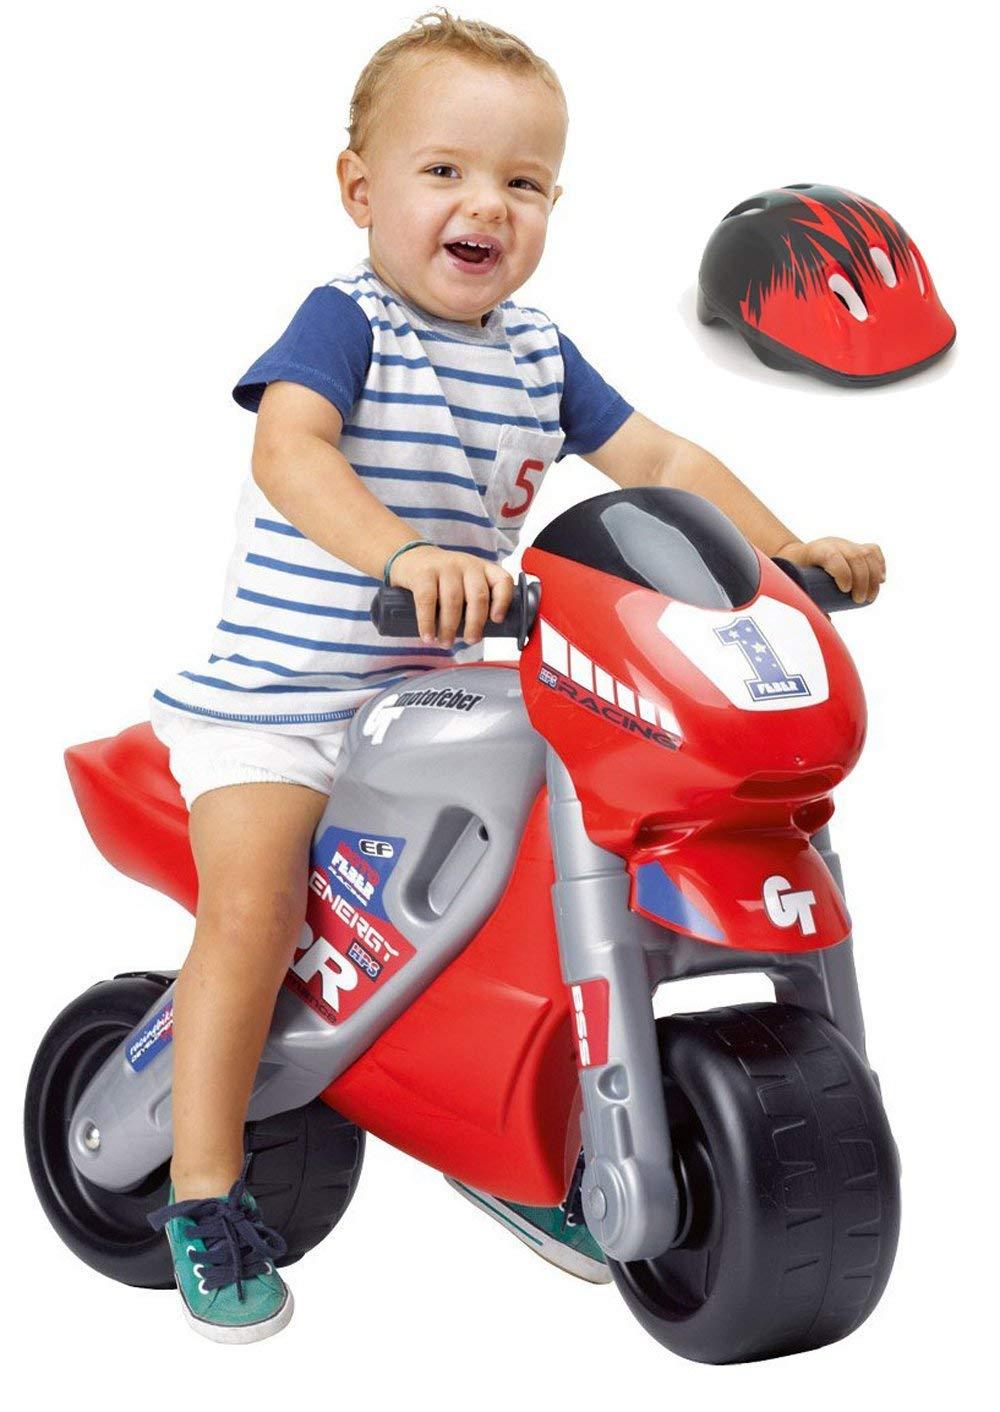 moto enfant 2 ans